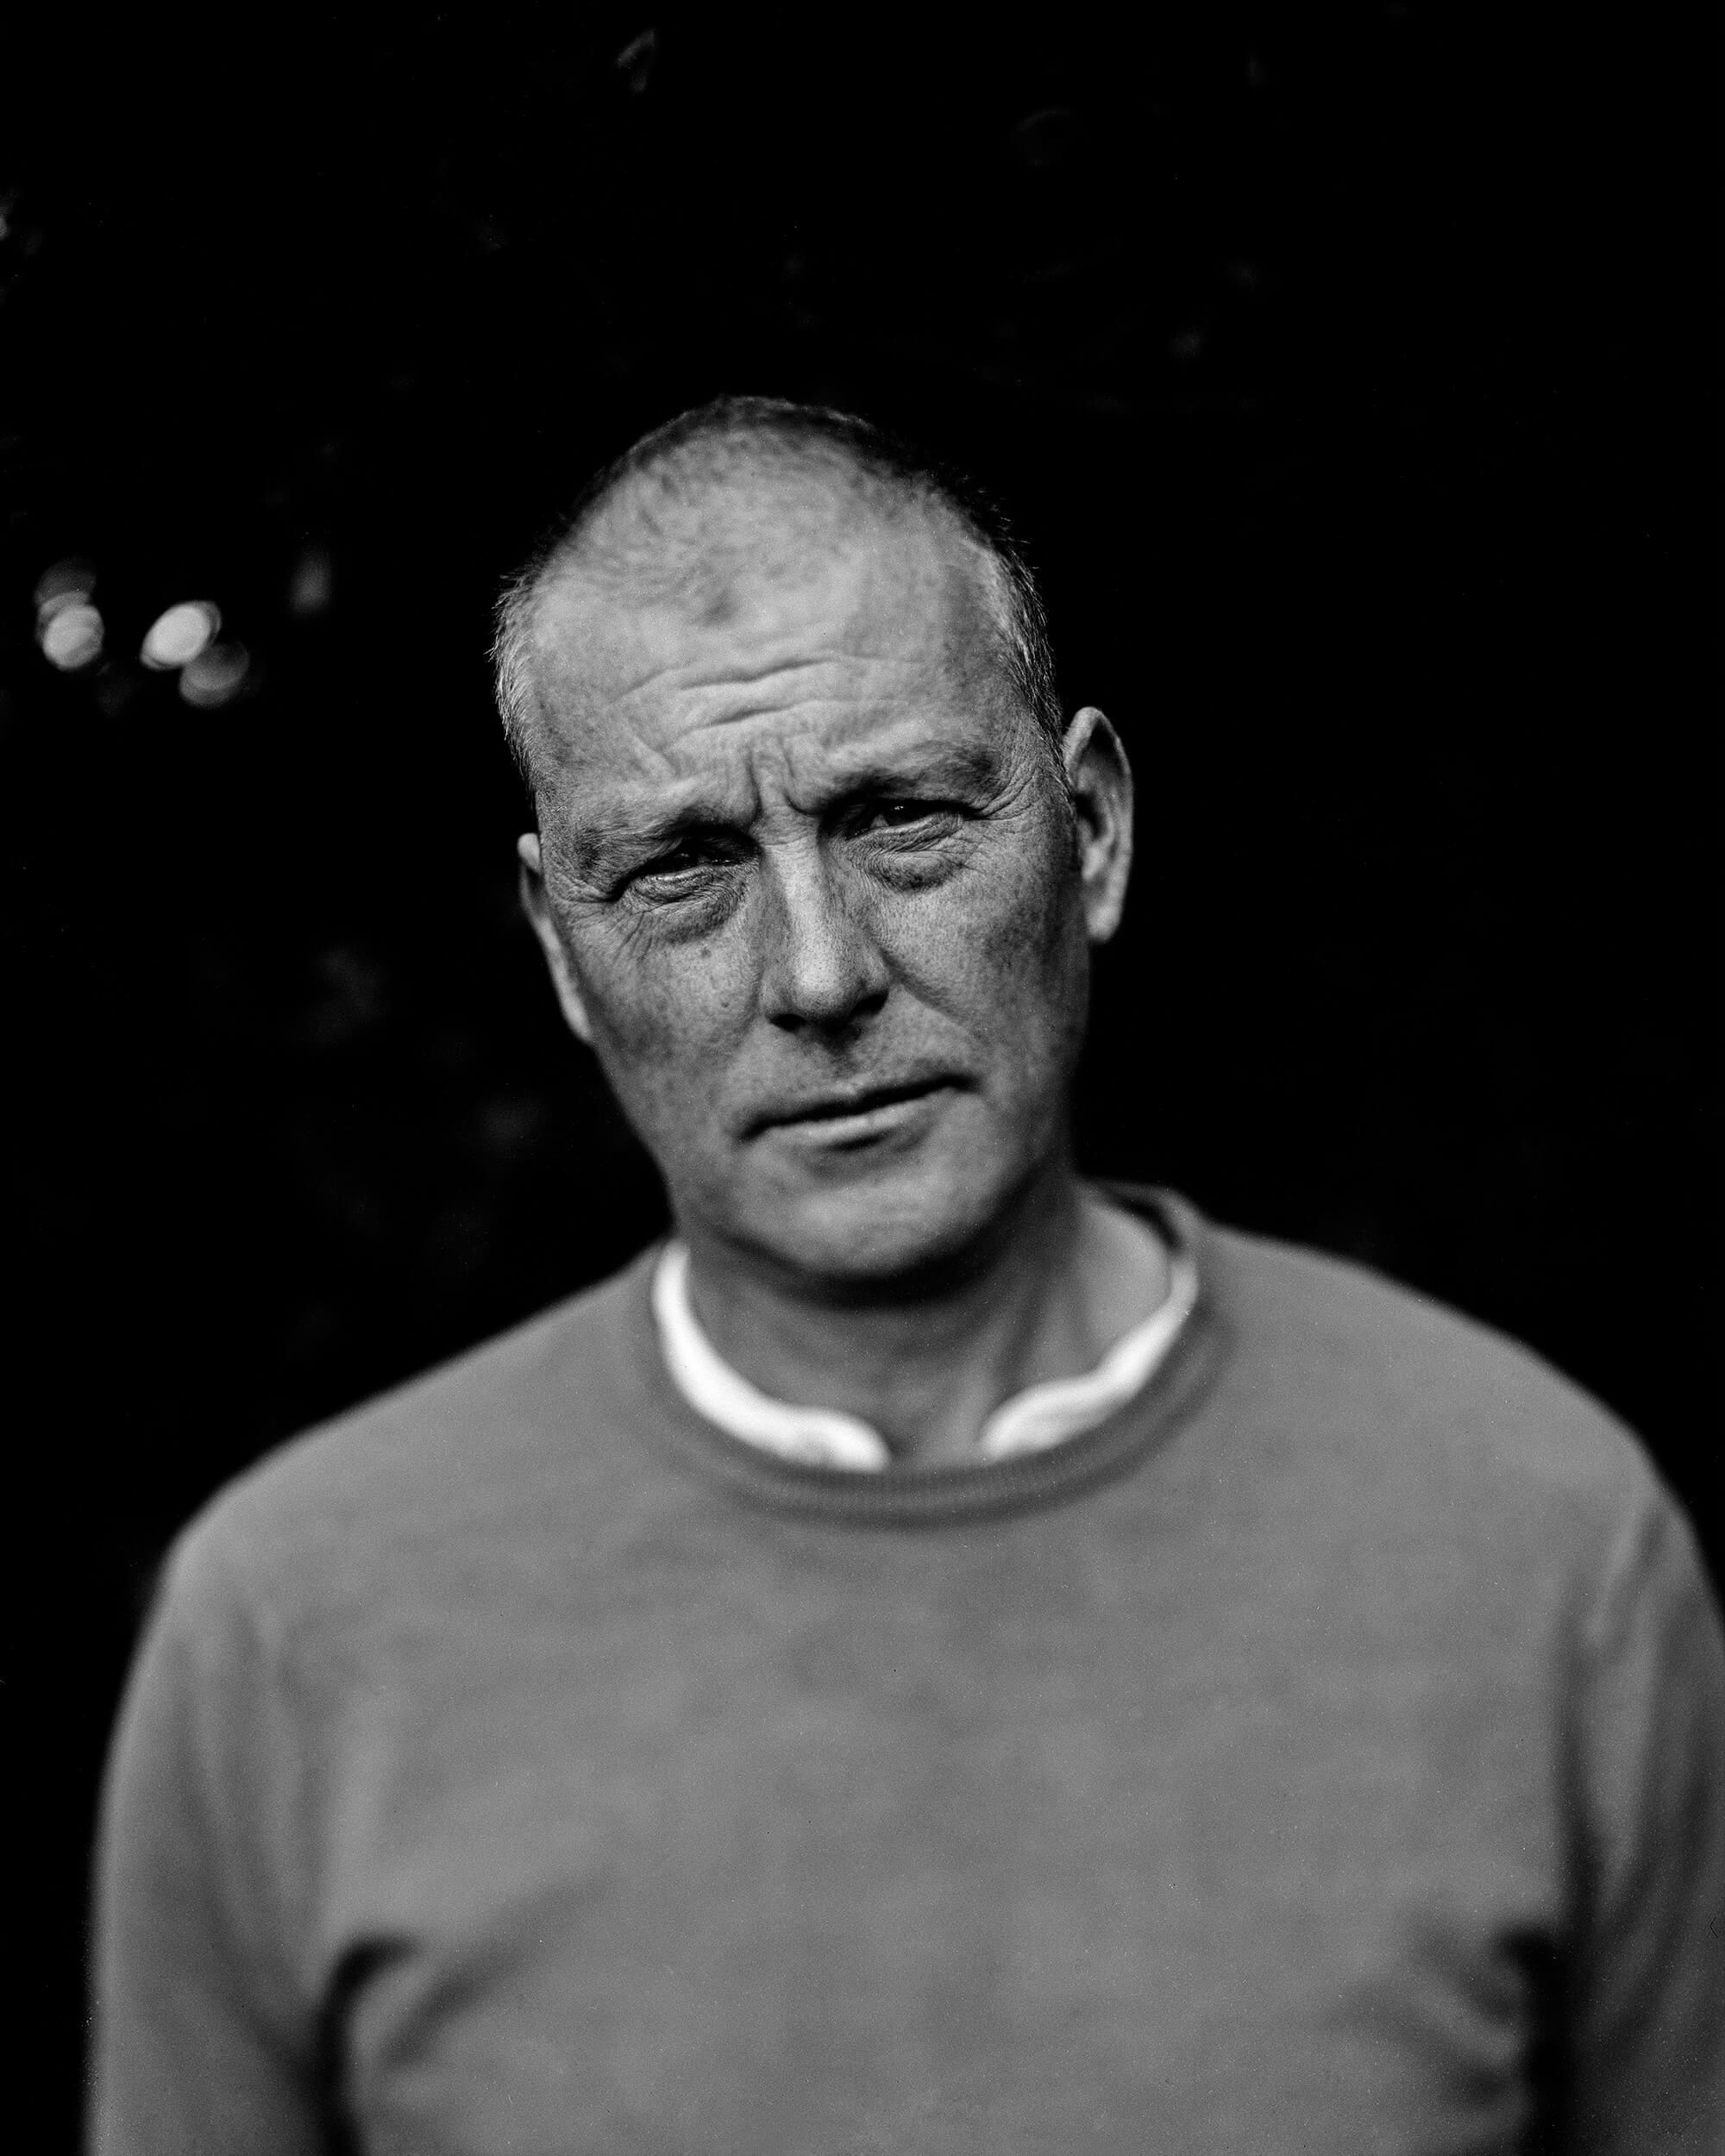 Abbie platt landscape the south west collective of photography black and white affair portrait of man